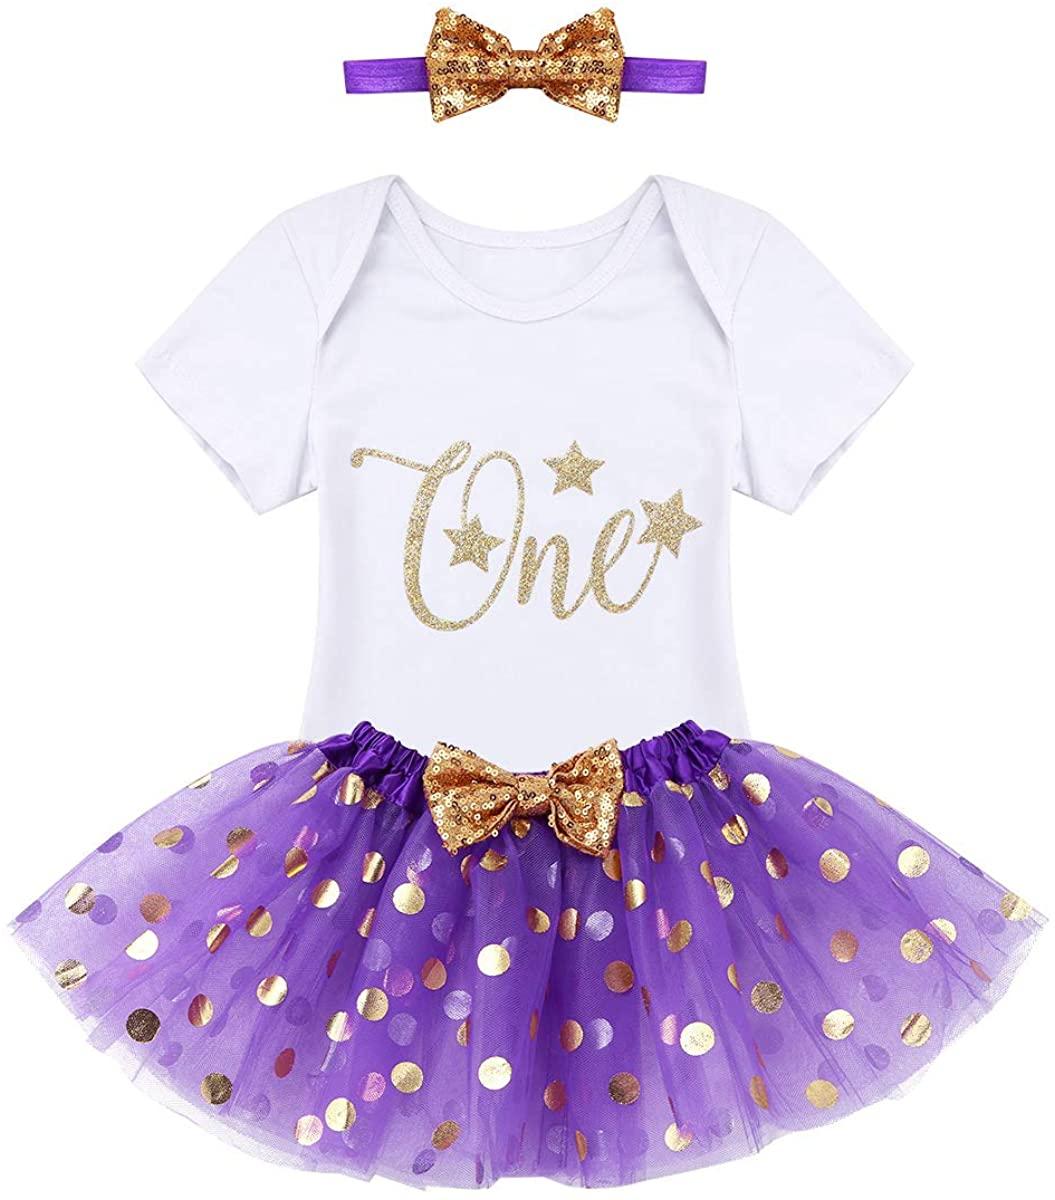 TiaoBug Infant Baby Girls Polka Dots Tutu Skirt Outfit Short Sleeves Glittery Letters Romper with Tutu Skirt Headband Set